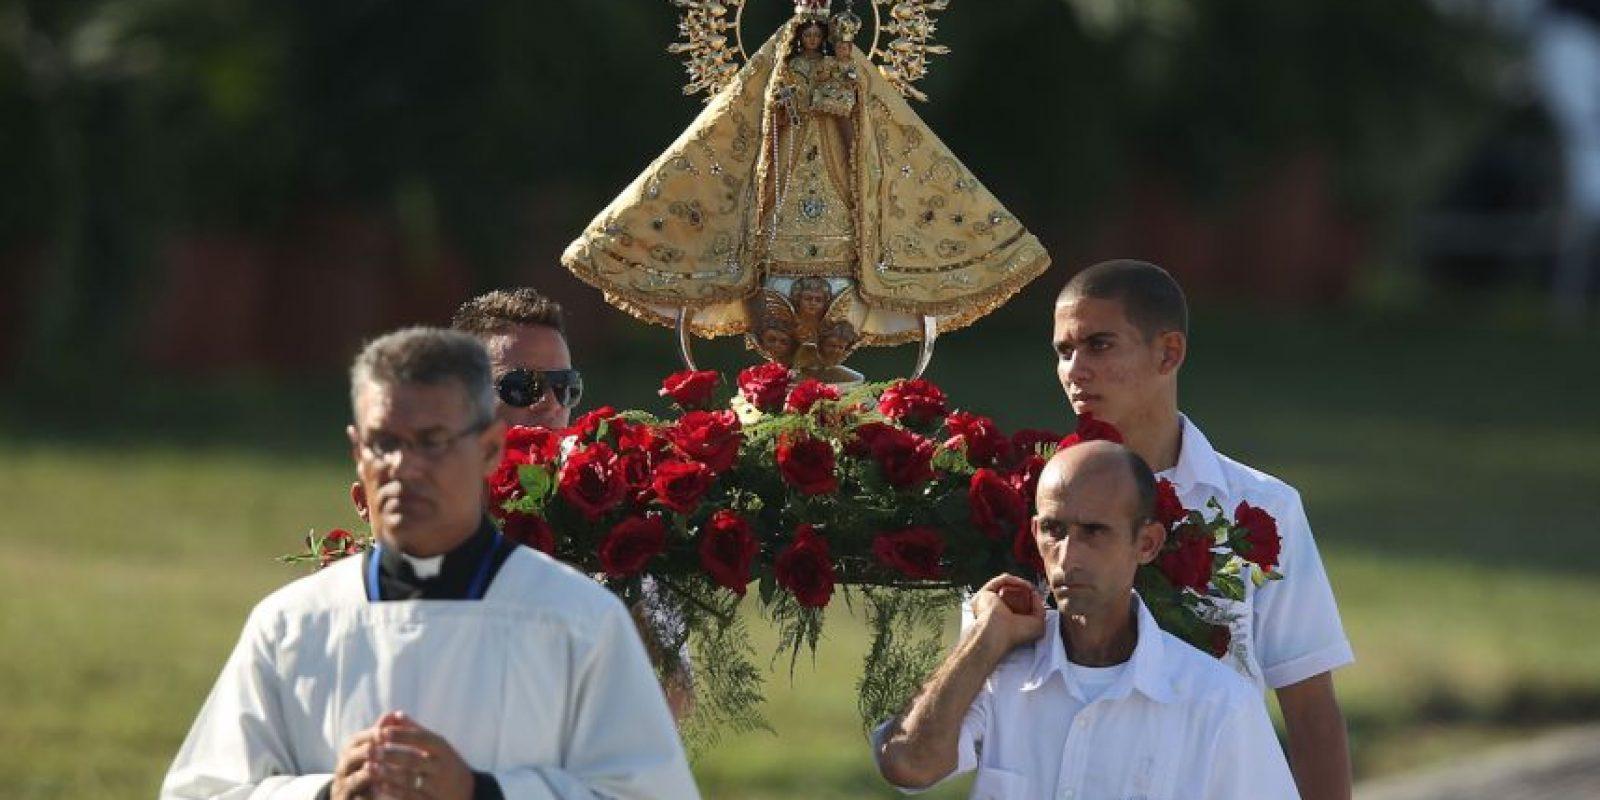 El lunes realizó una misa masiva en Holguín, en la que instó a los fieles a ser humildes. Foto:Getty Images